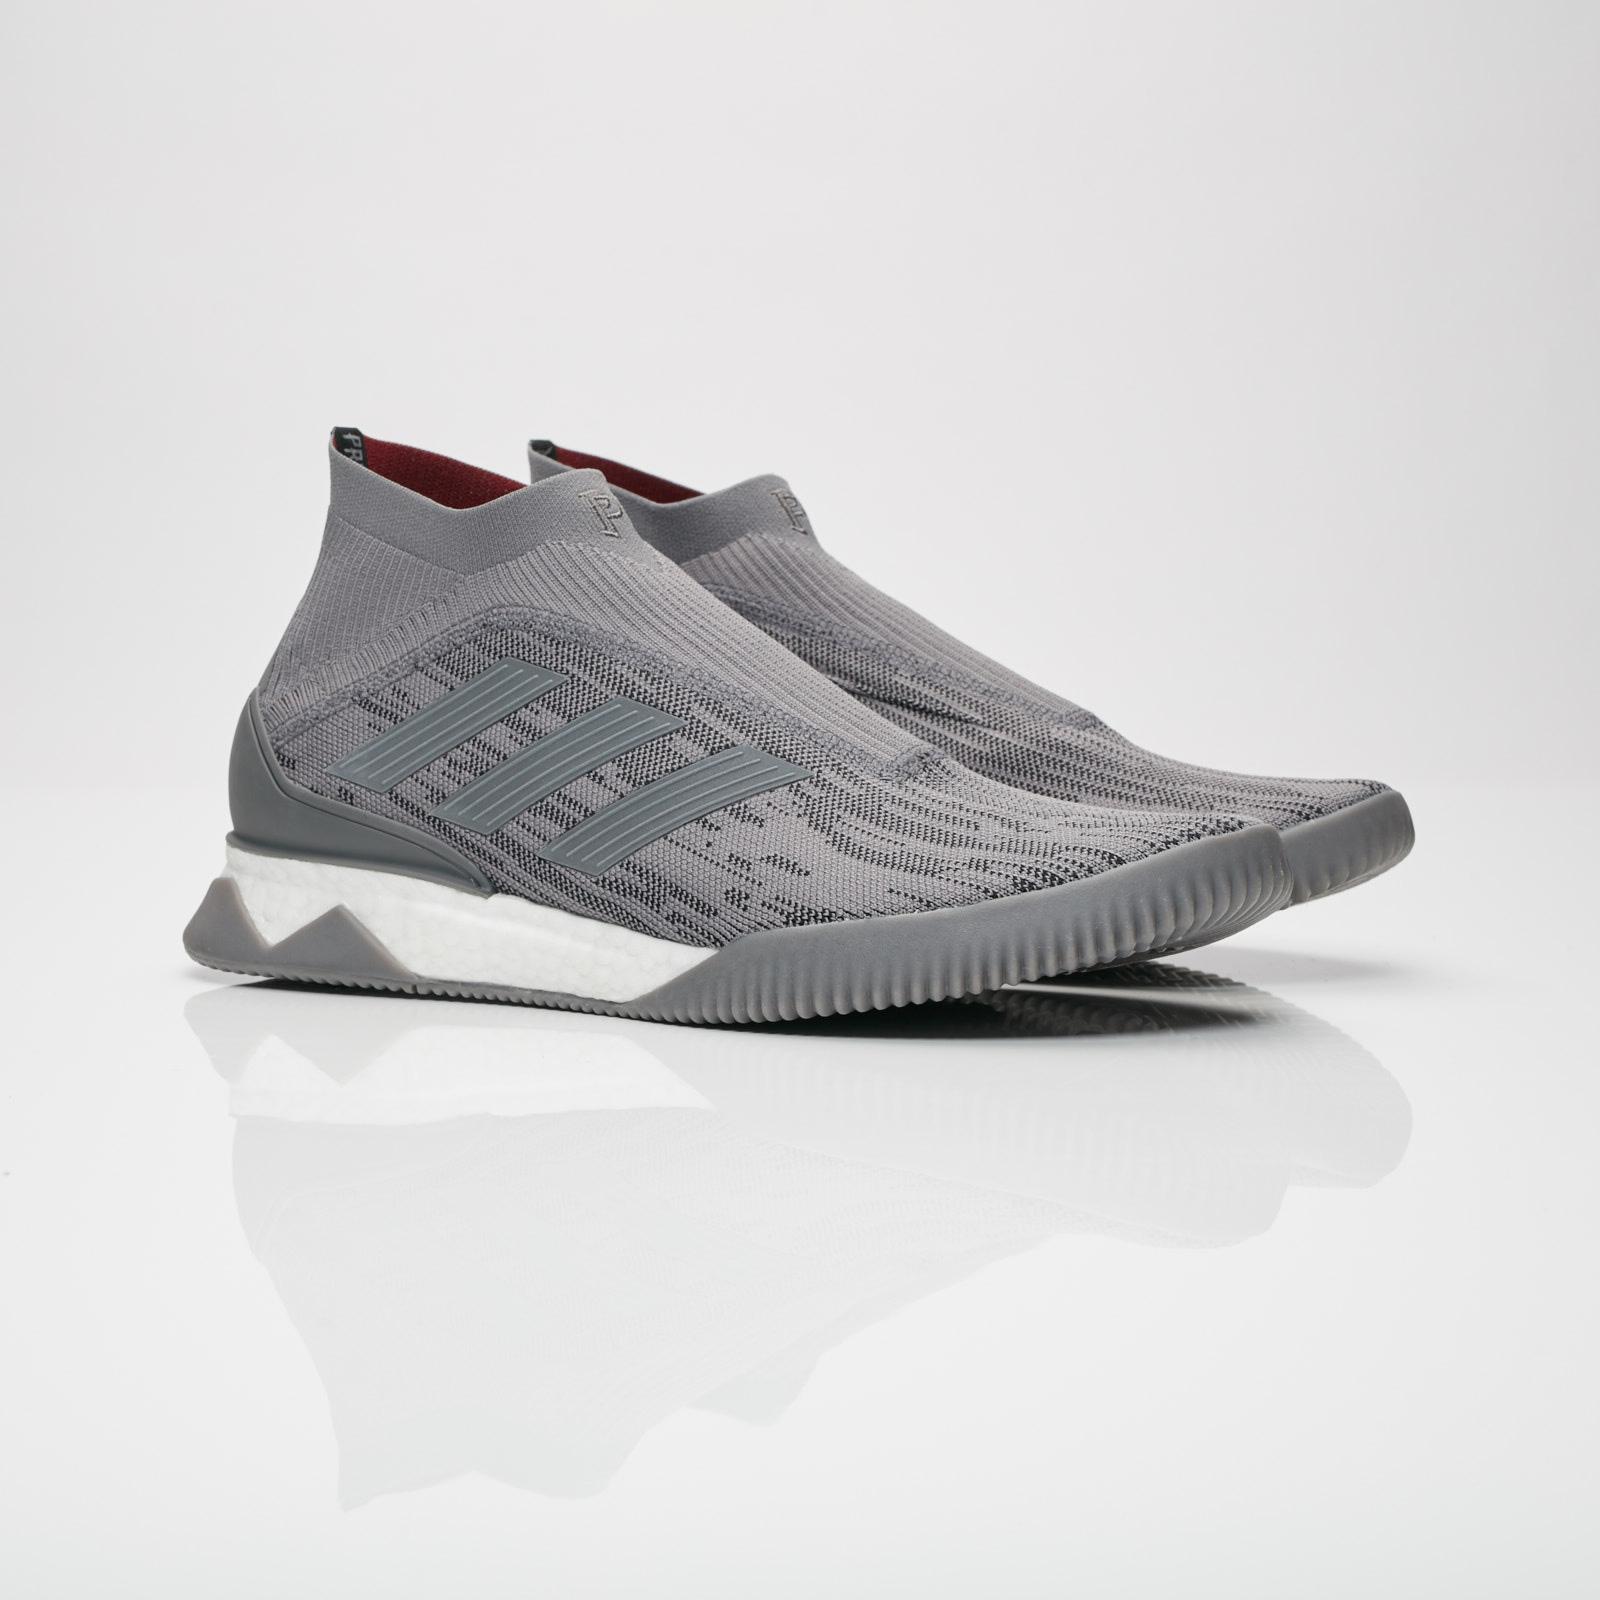 Alfabeto intervalo gráfico  adidas Paul Pogba Predator 18+ TR - Ac7455 - Sneakersnstuff ...